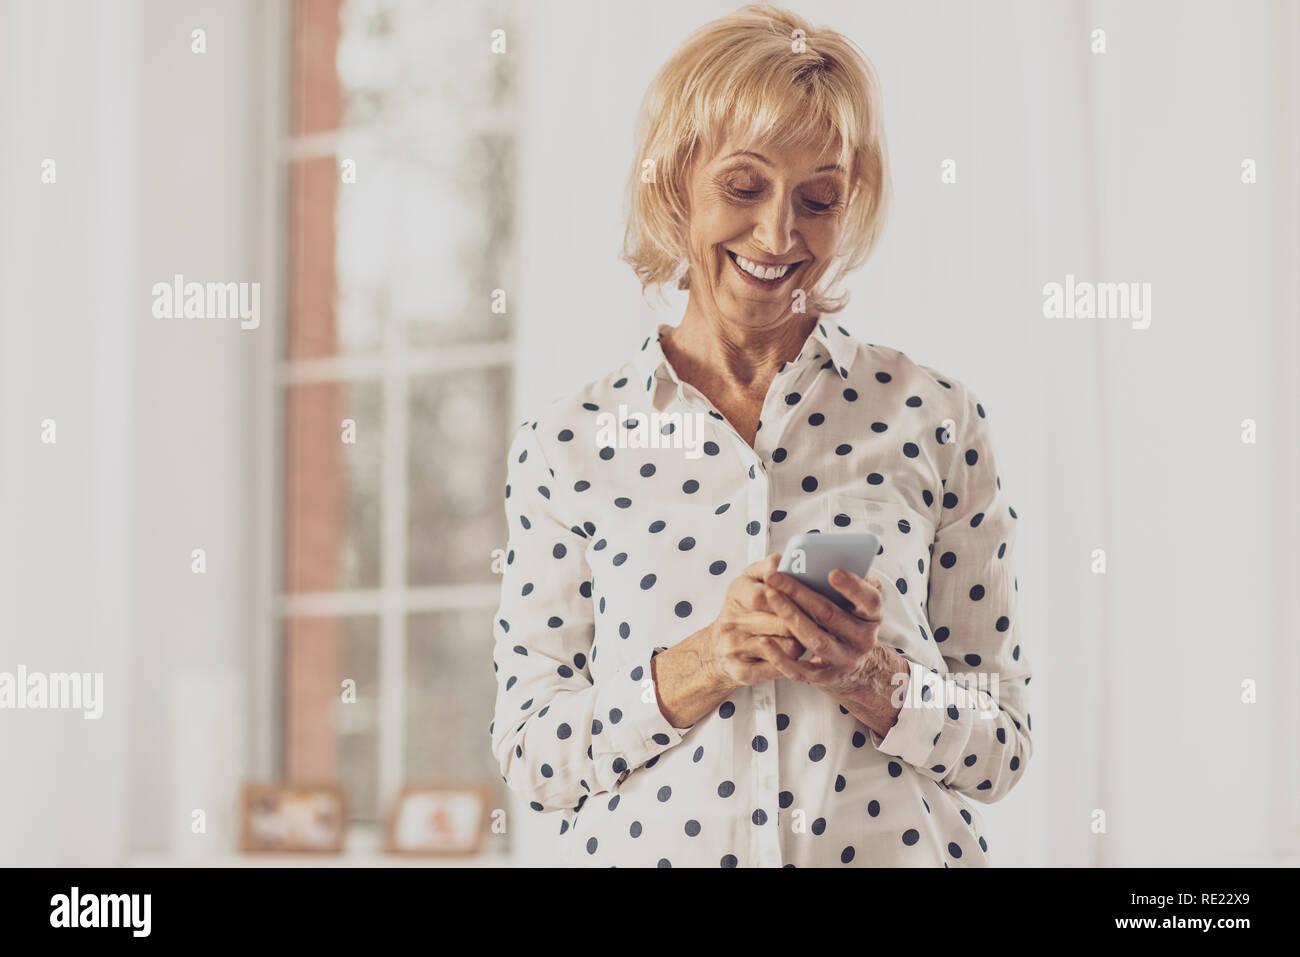 Joyful housewife typing friendly message - Stock Image